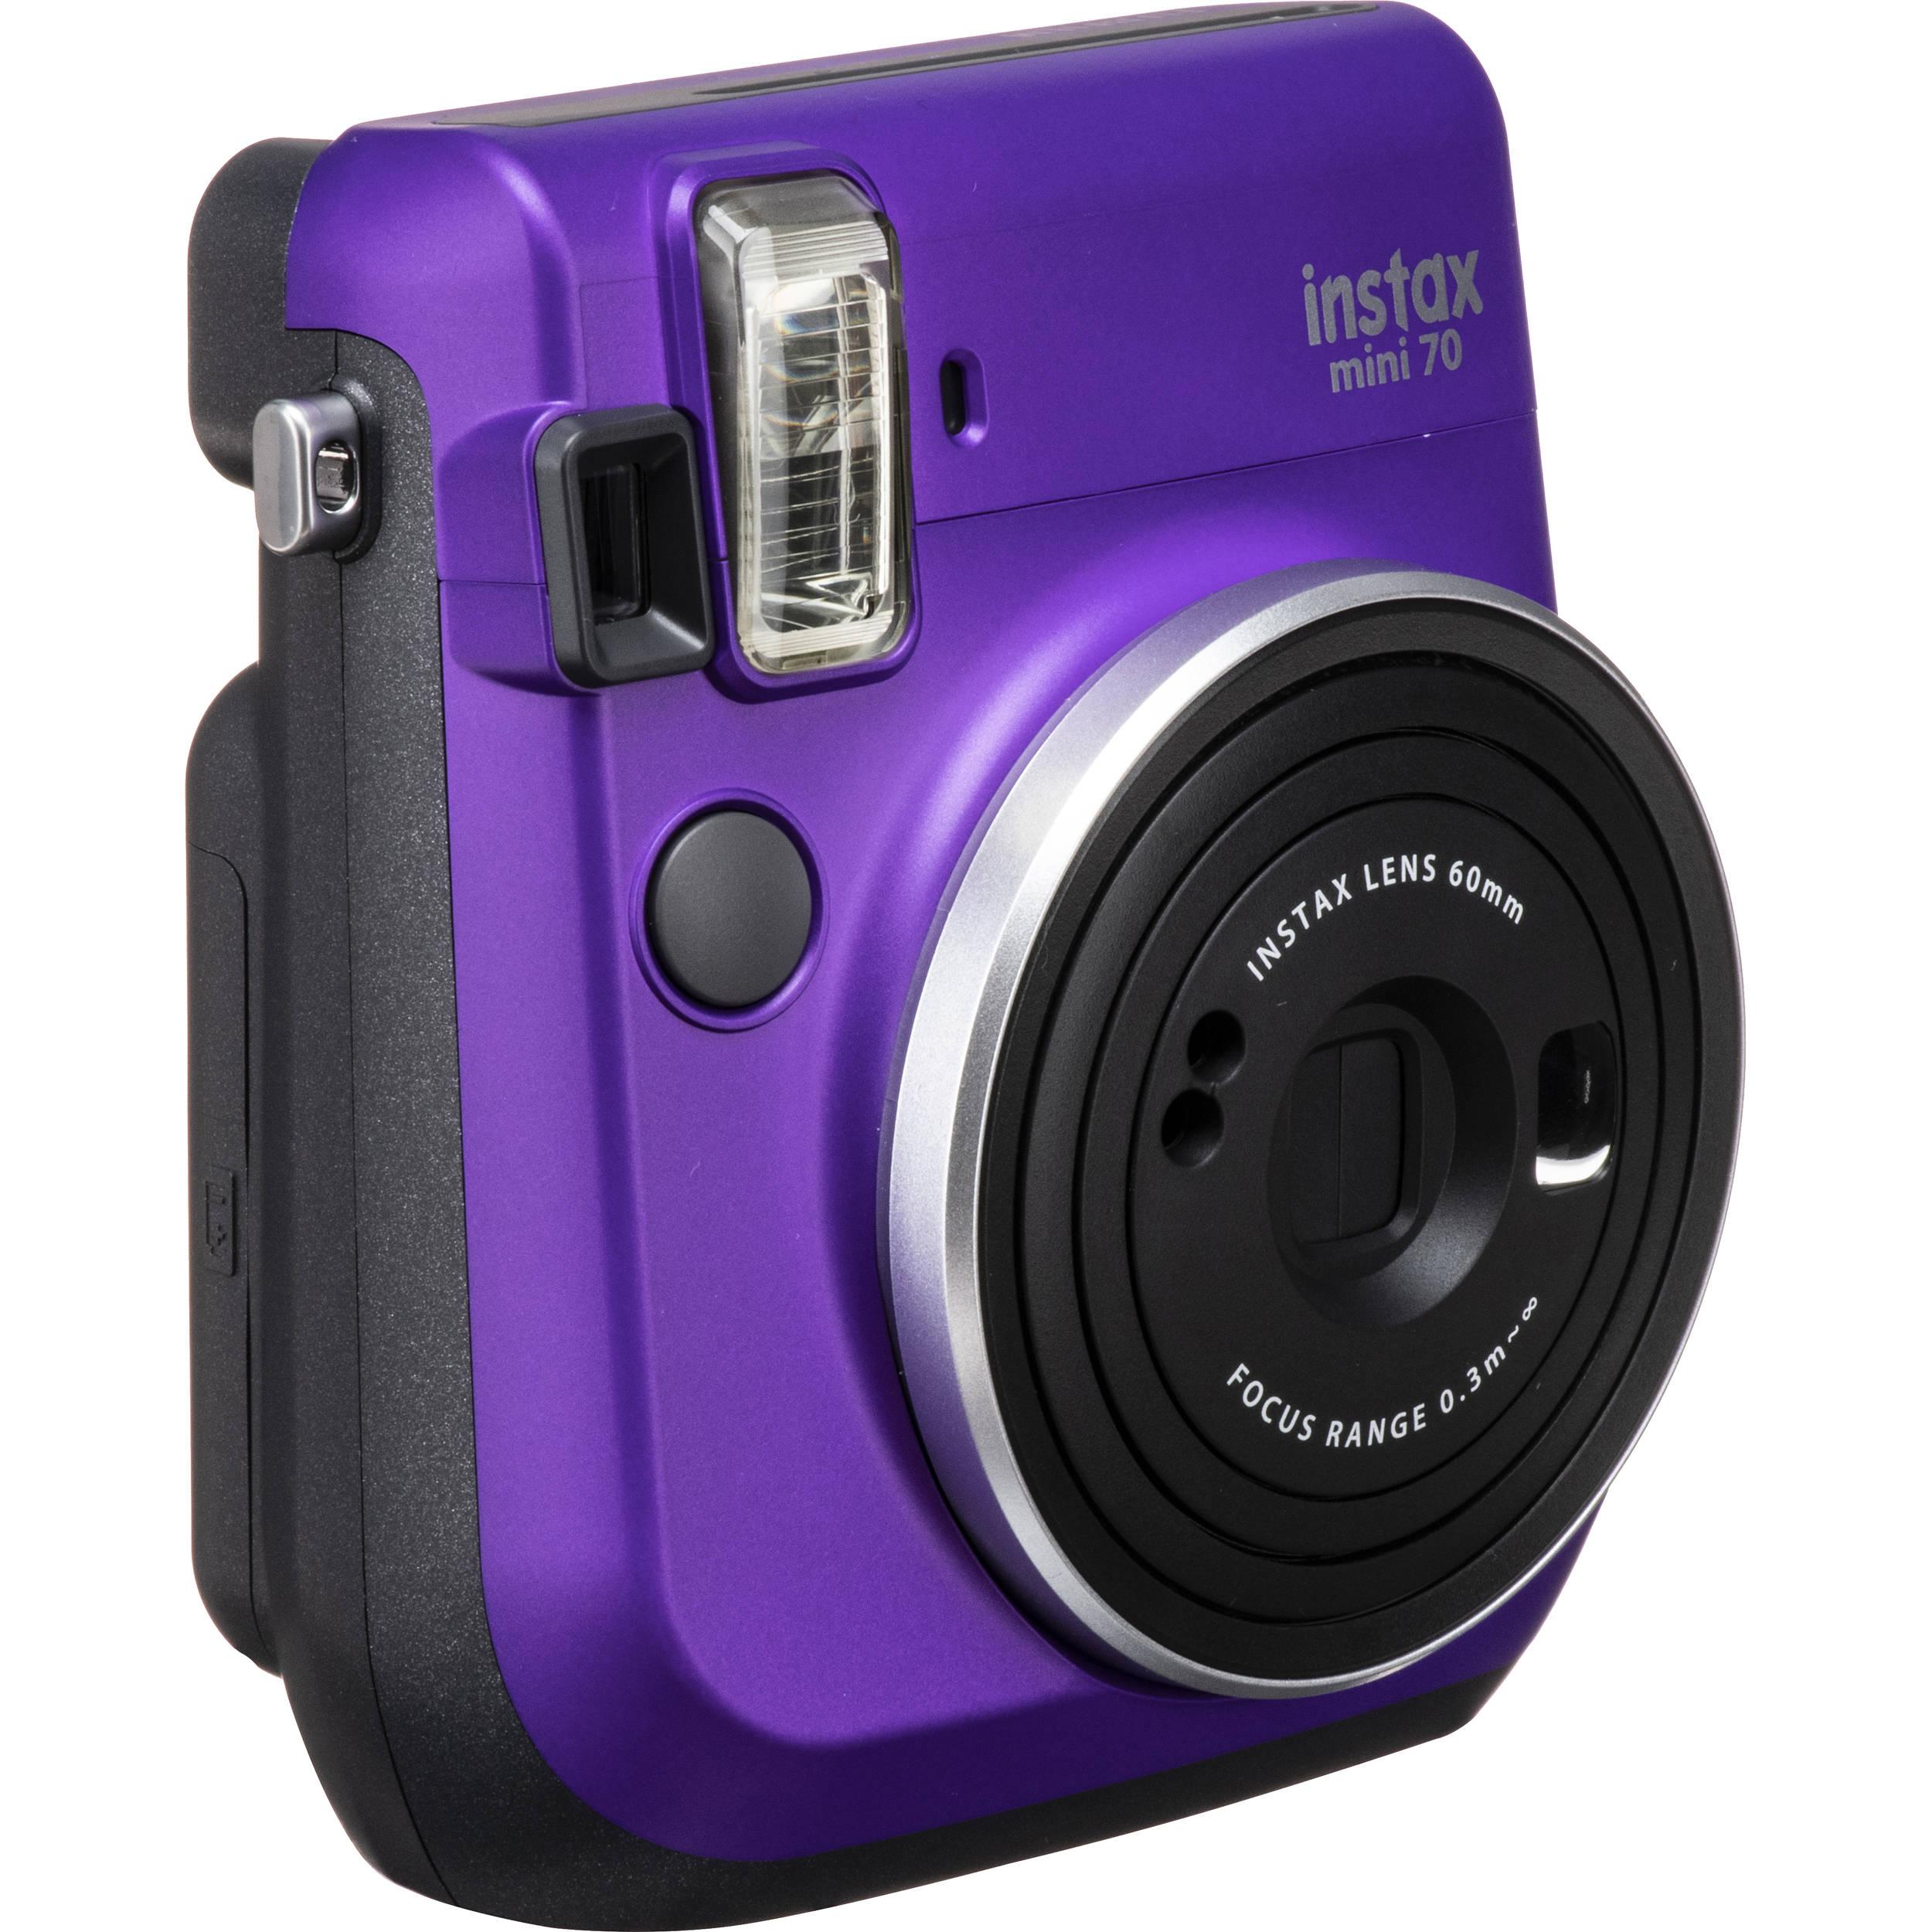 Fujifilm instax mini 70 Instant Film Camera (Black